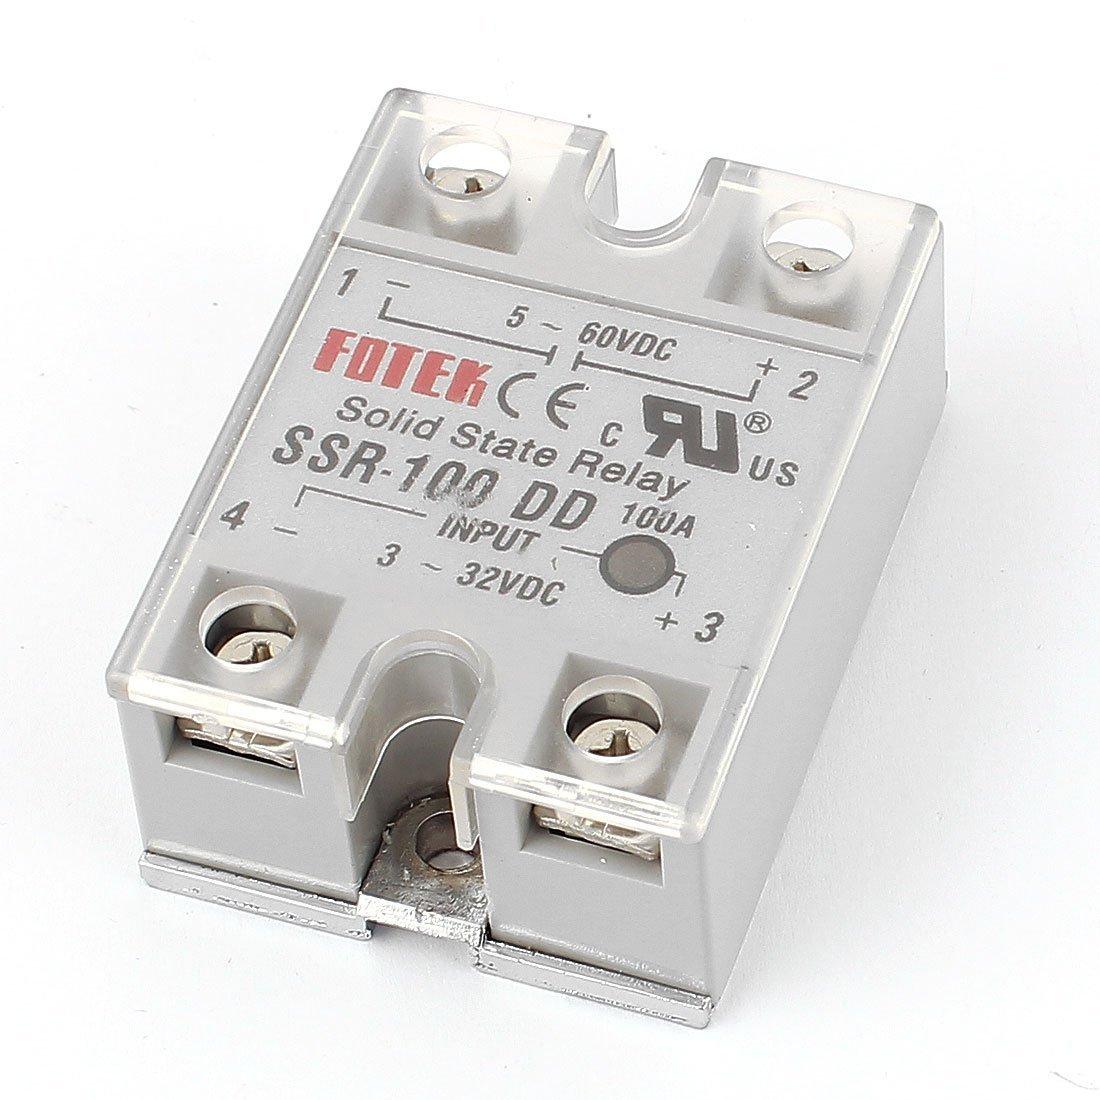 Módulo de relé de estado sólido SSR-100 DD CC-CC 100A 3-32VDC / 5-60VDC DealMux DLM-B019132BZS